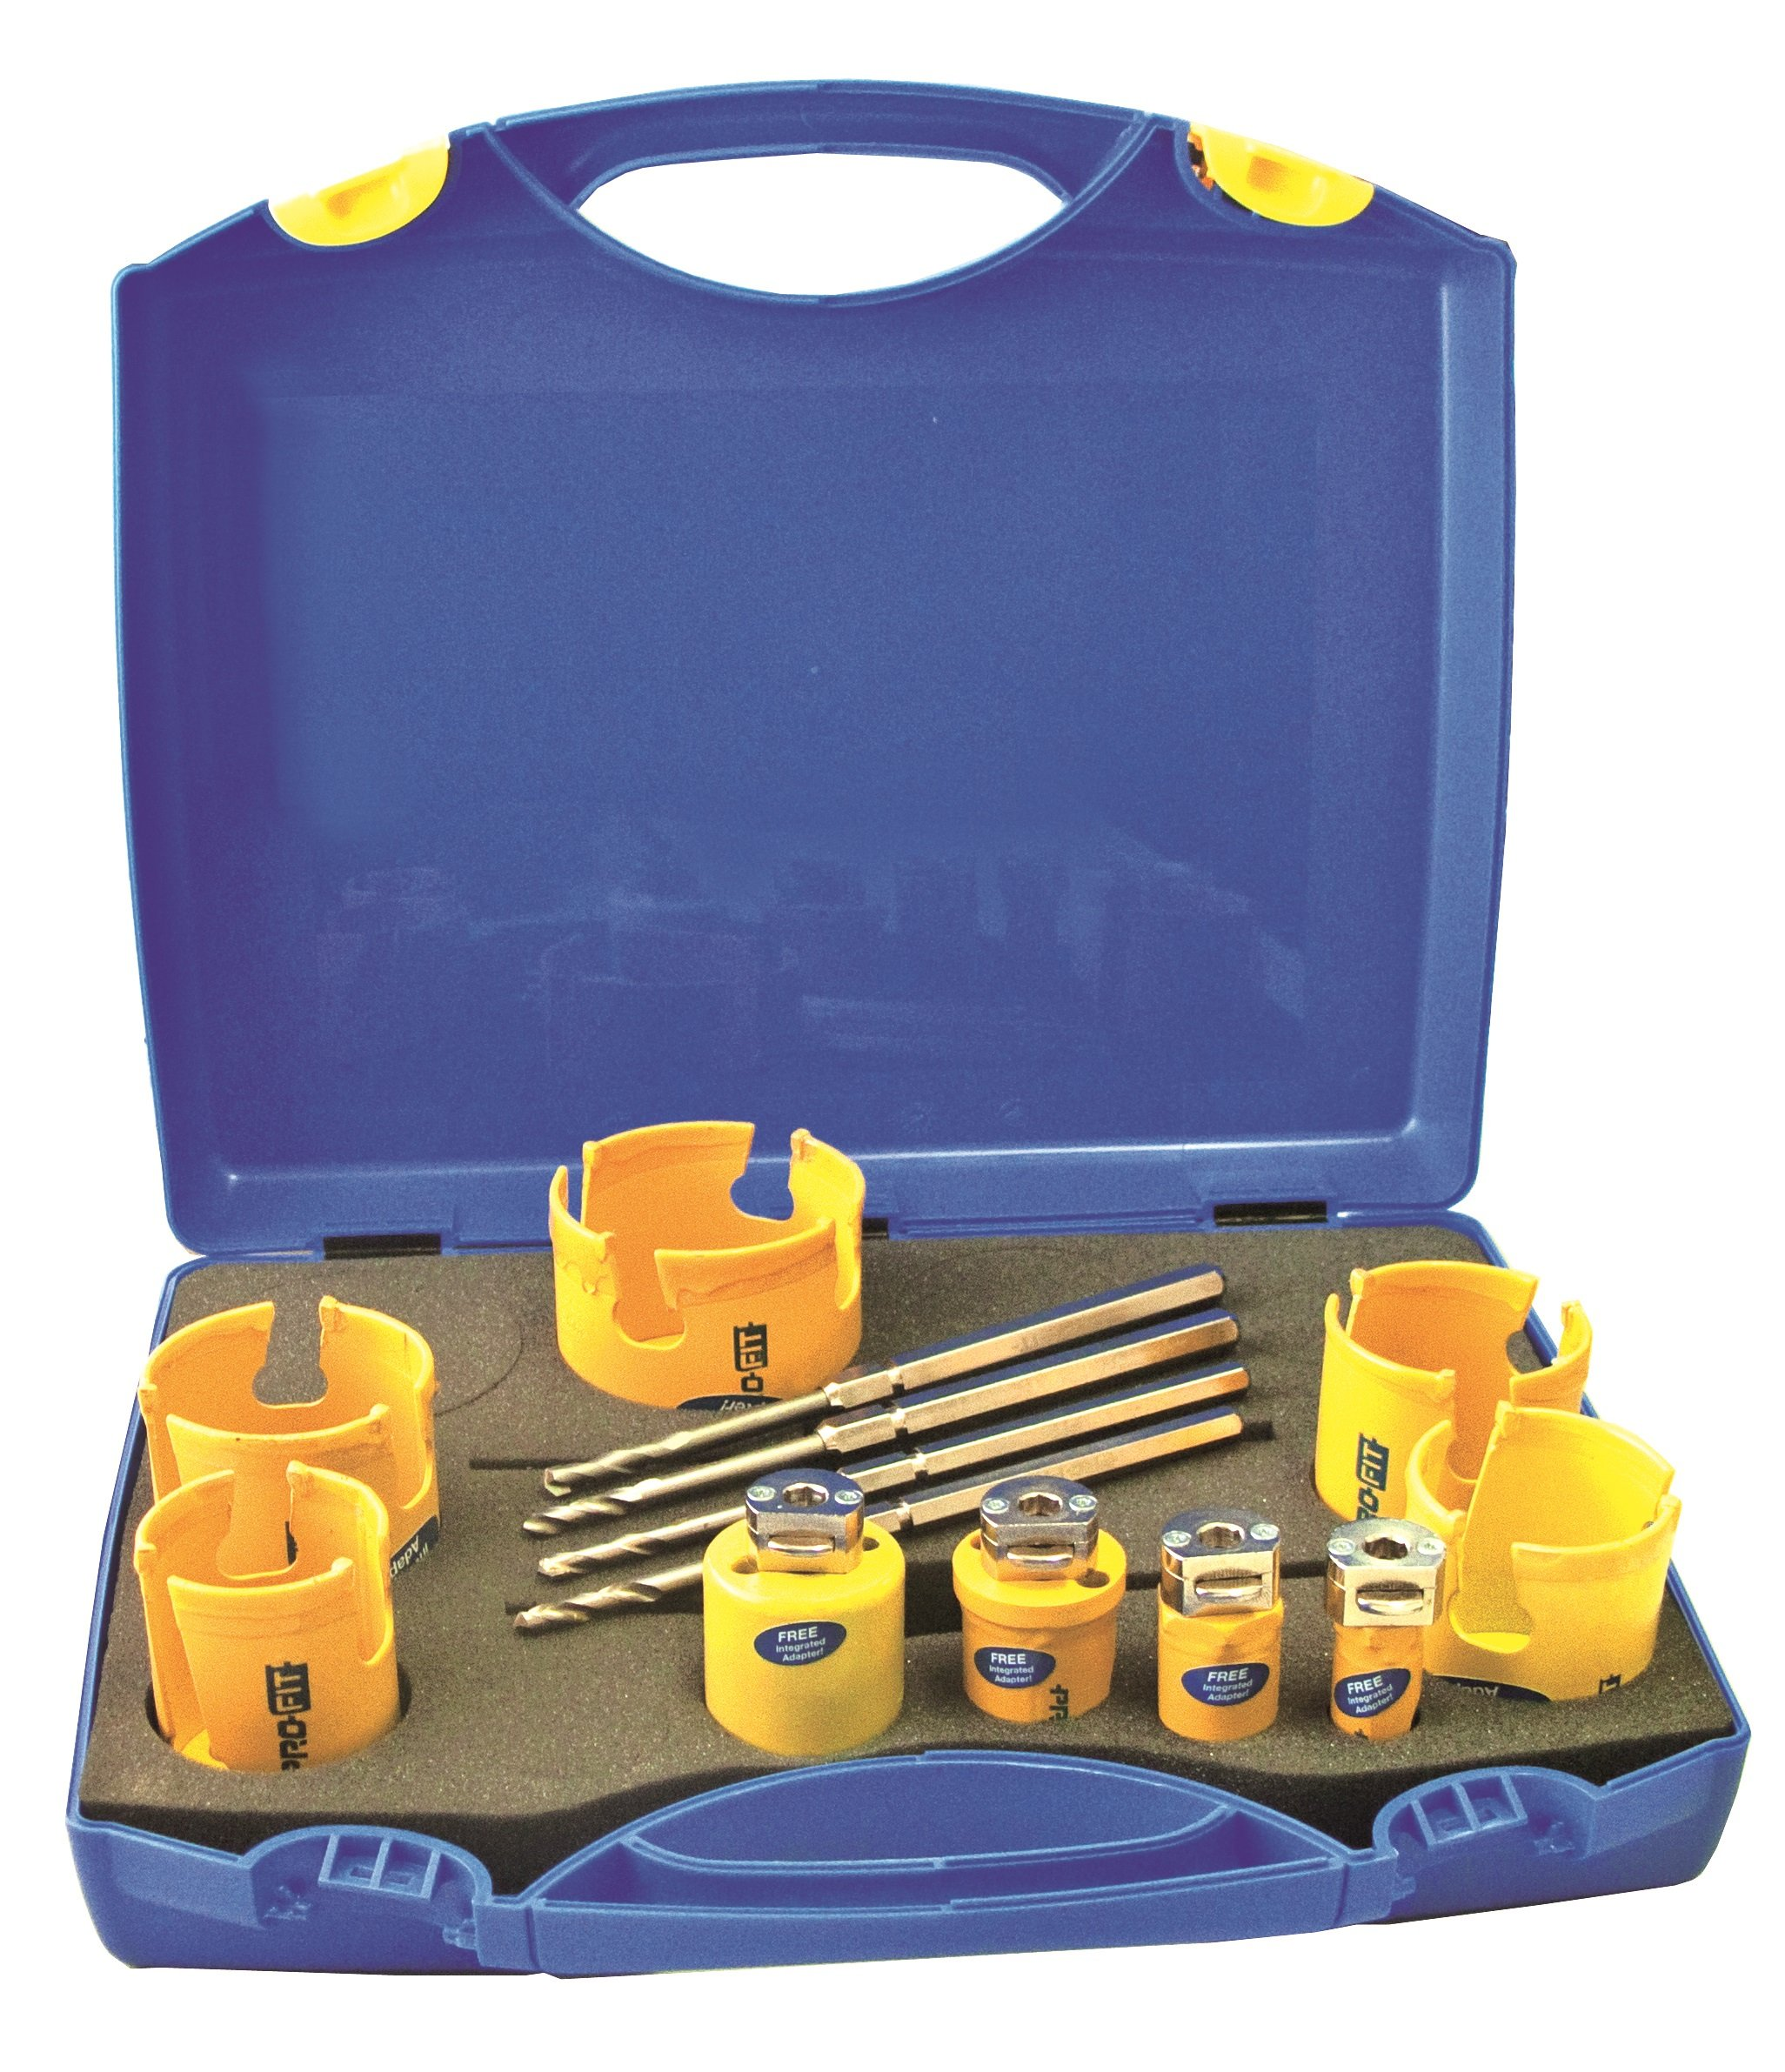 ProFit 1018 0161520CT Carbide Tipped Multi Purpose Kit with Accessories QLH1MP/QLH2MP/QLH1MPCT/QLH2MPCT, Blue, 17-Piece